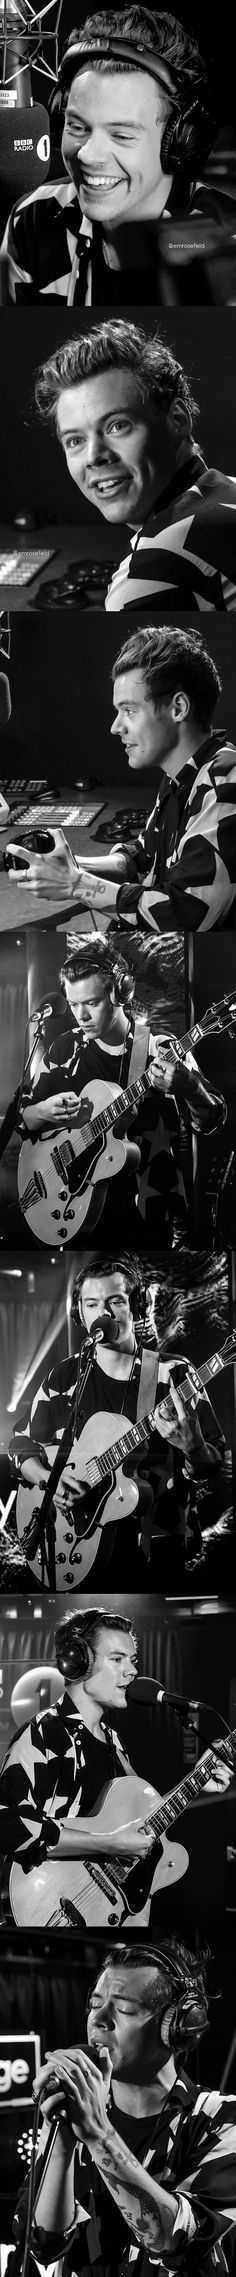 Harry Styles | BBC R1 Live Lounge 9.11.17 |